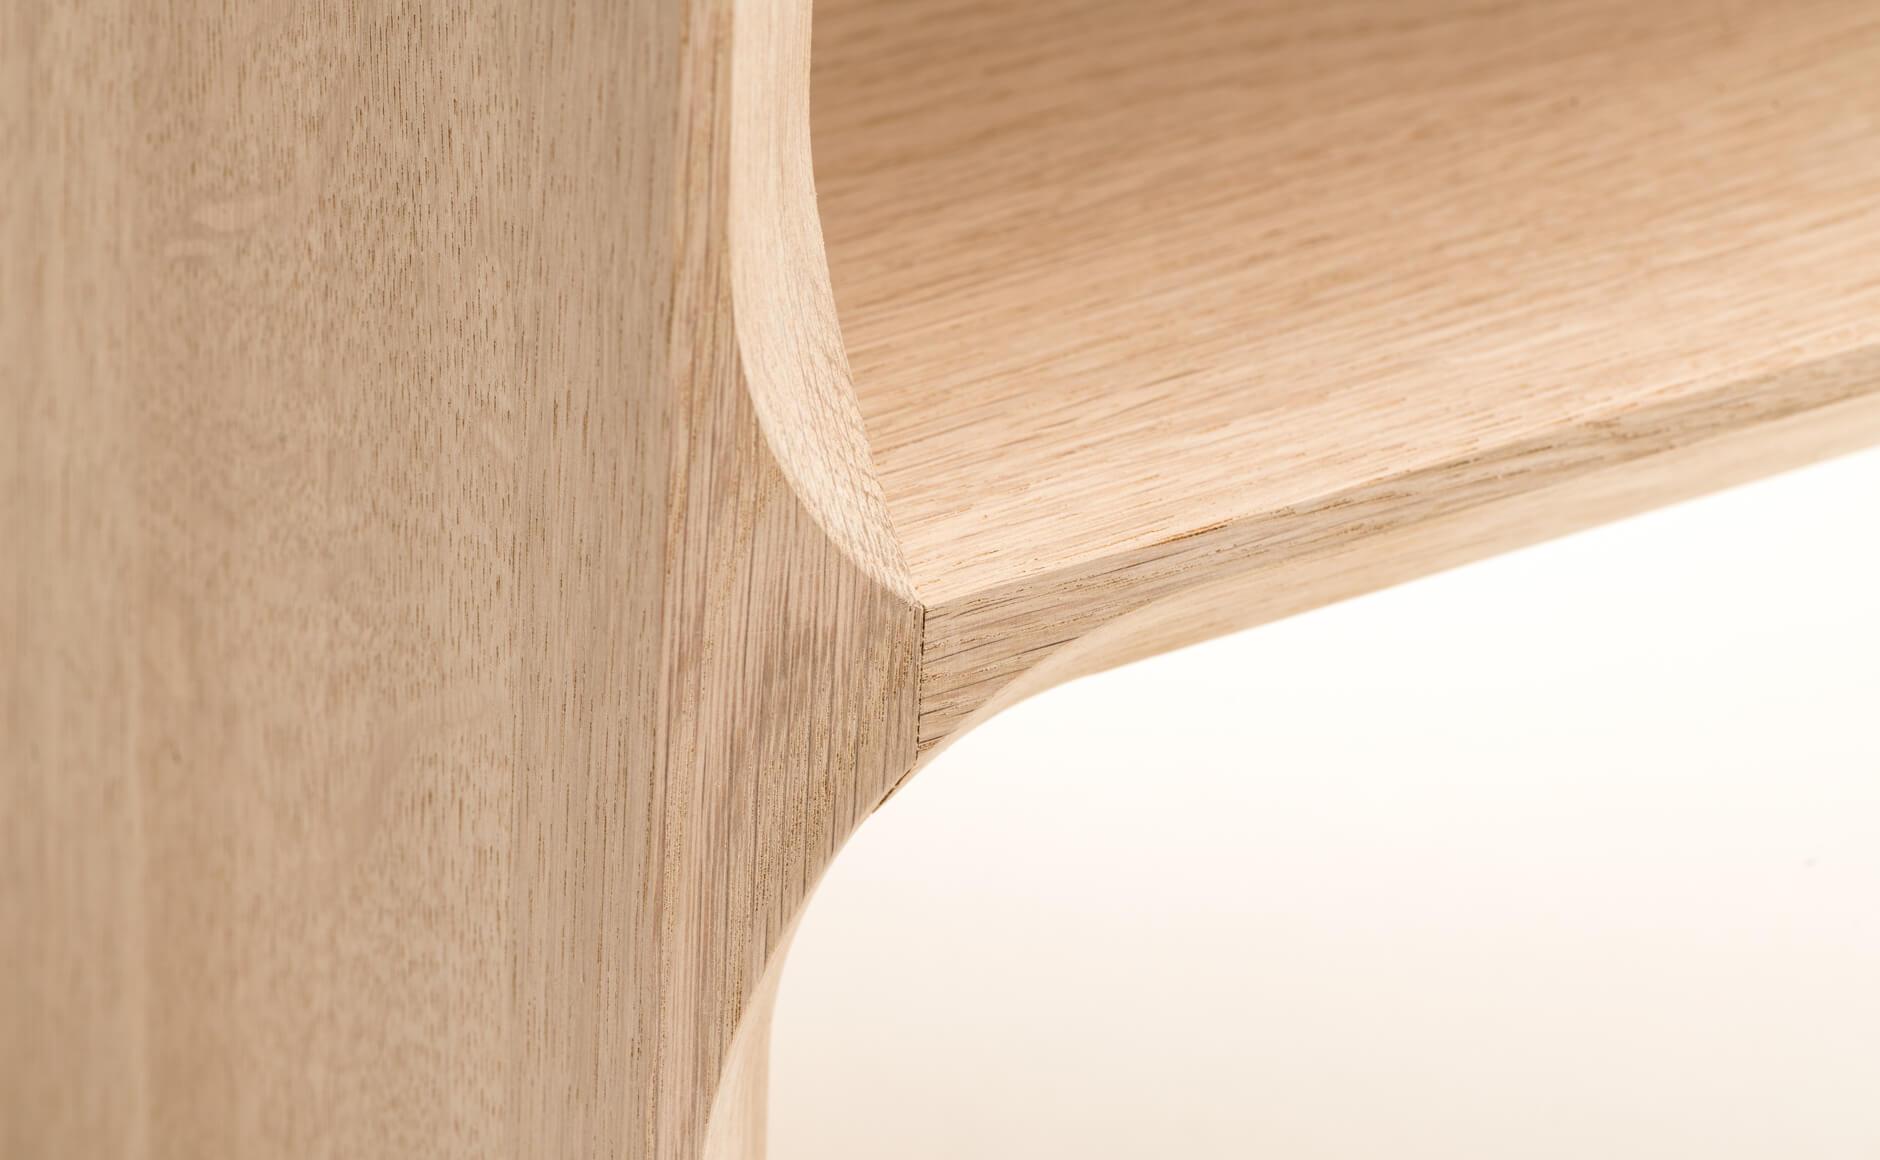 slide-6R-design-adrien-rovero_3